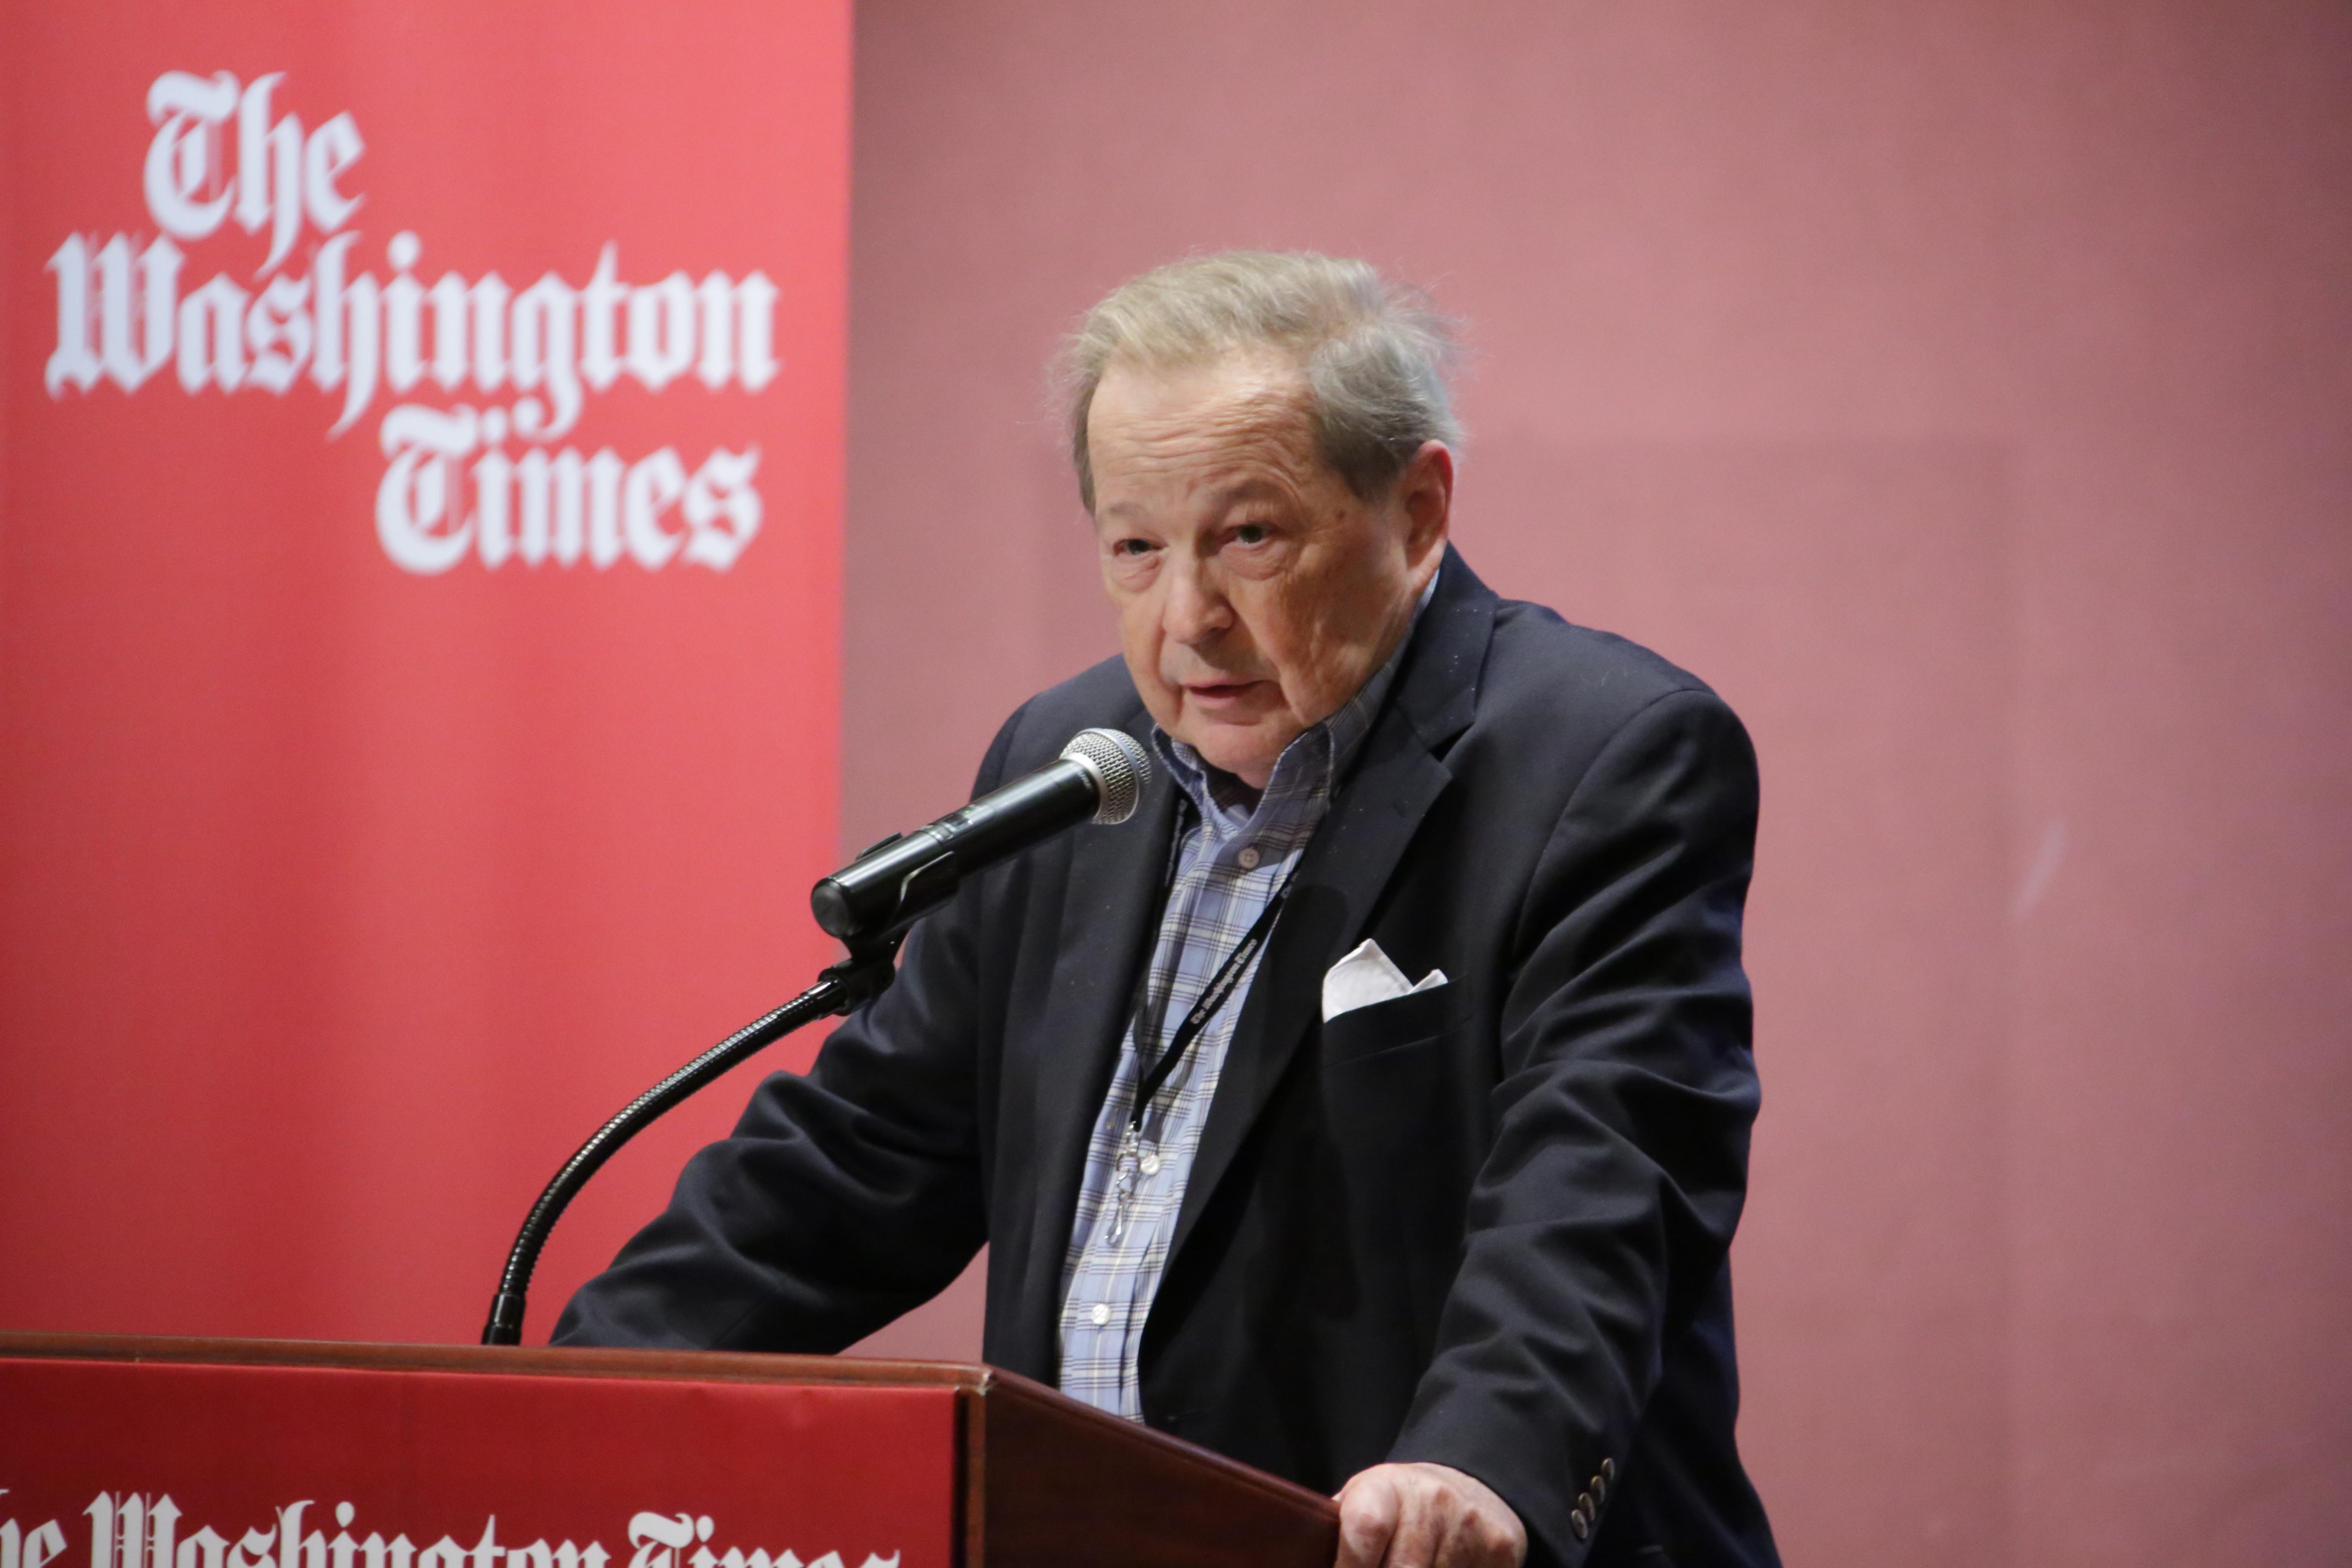 Charles Hurt at The Washington Times - Cover